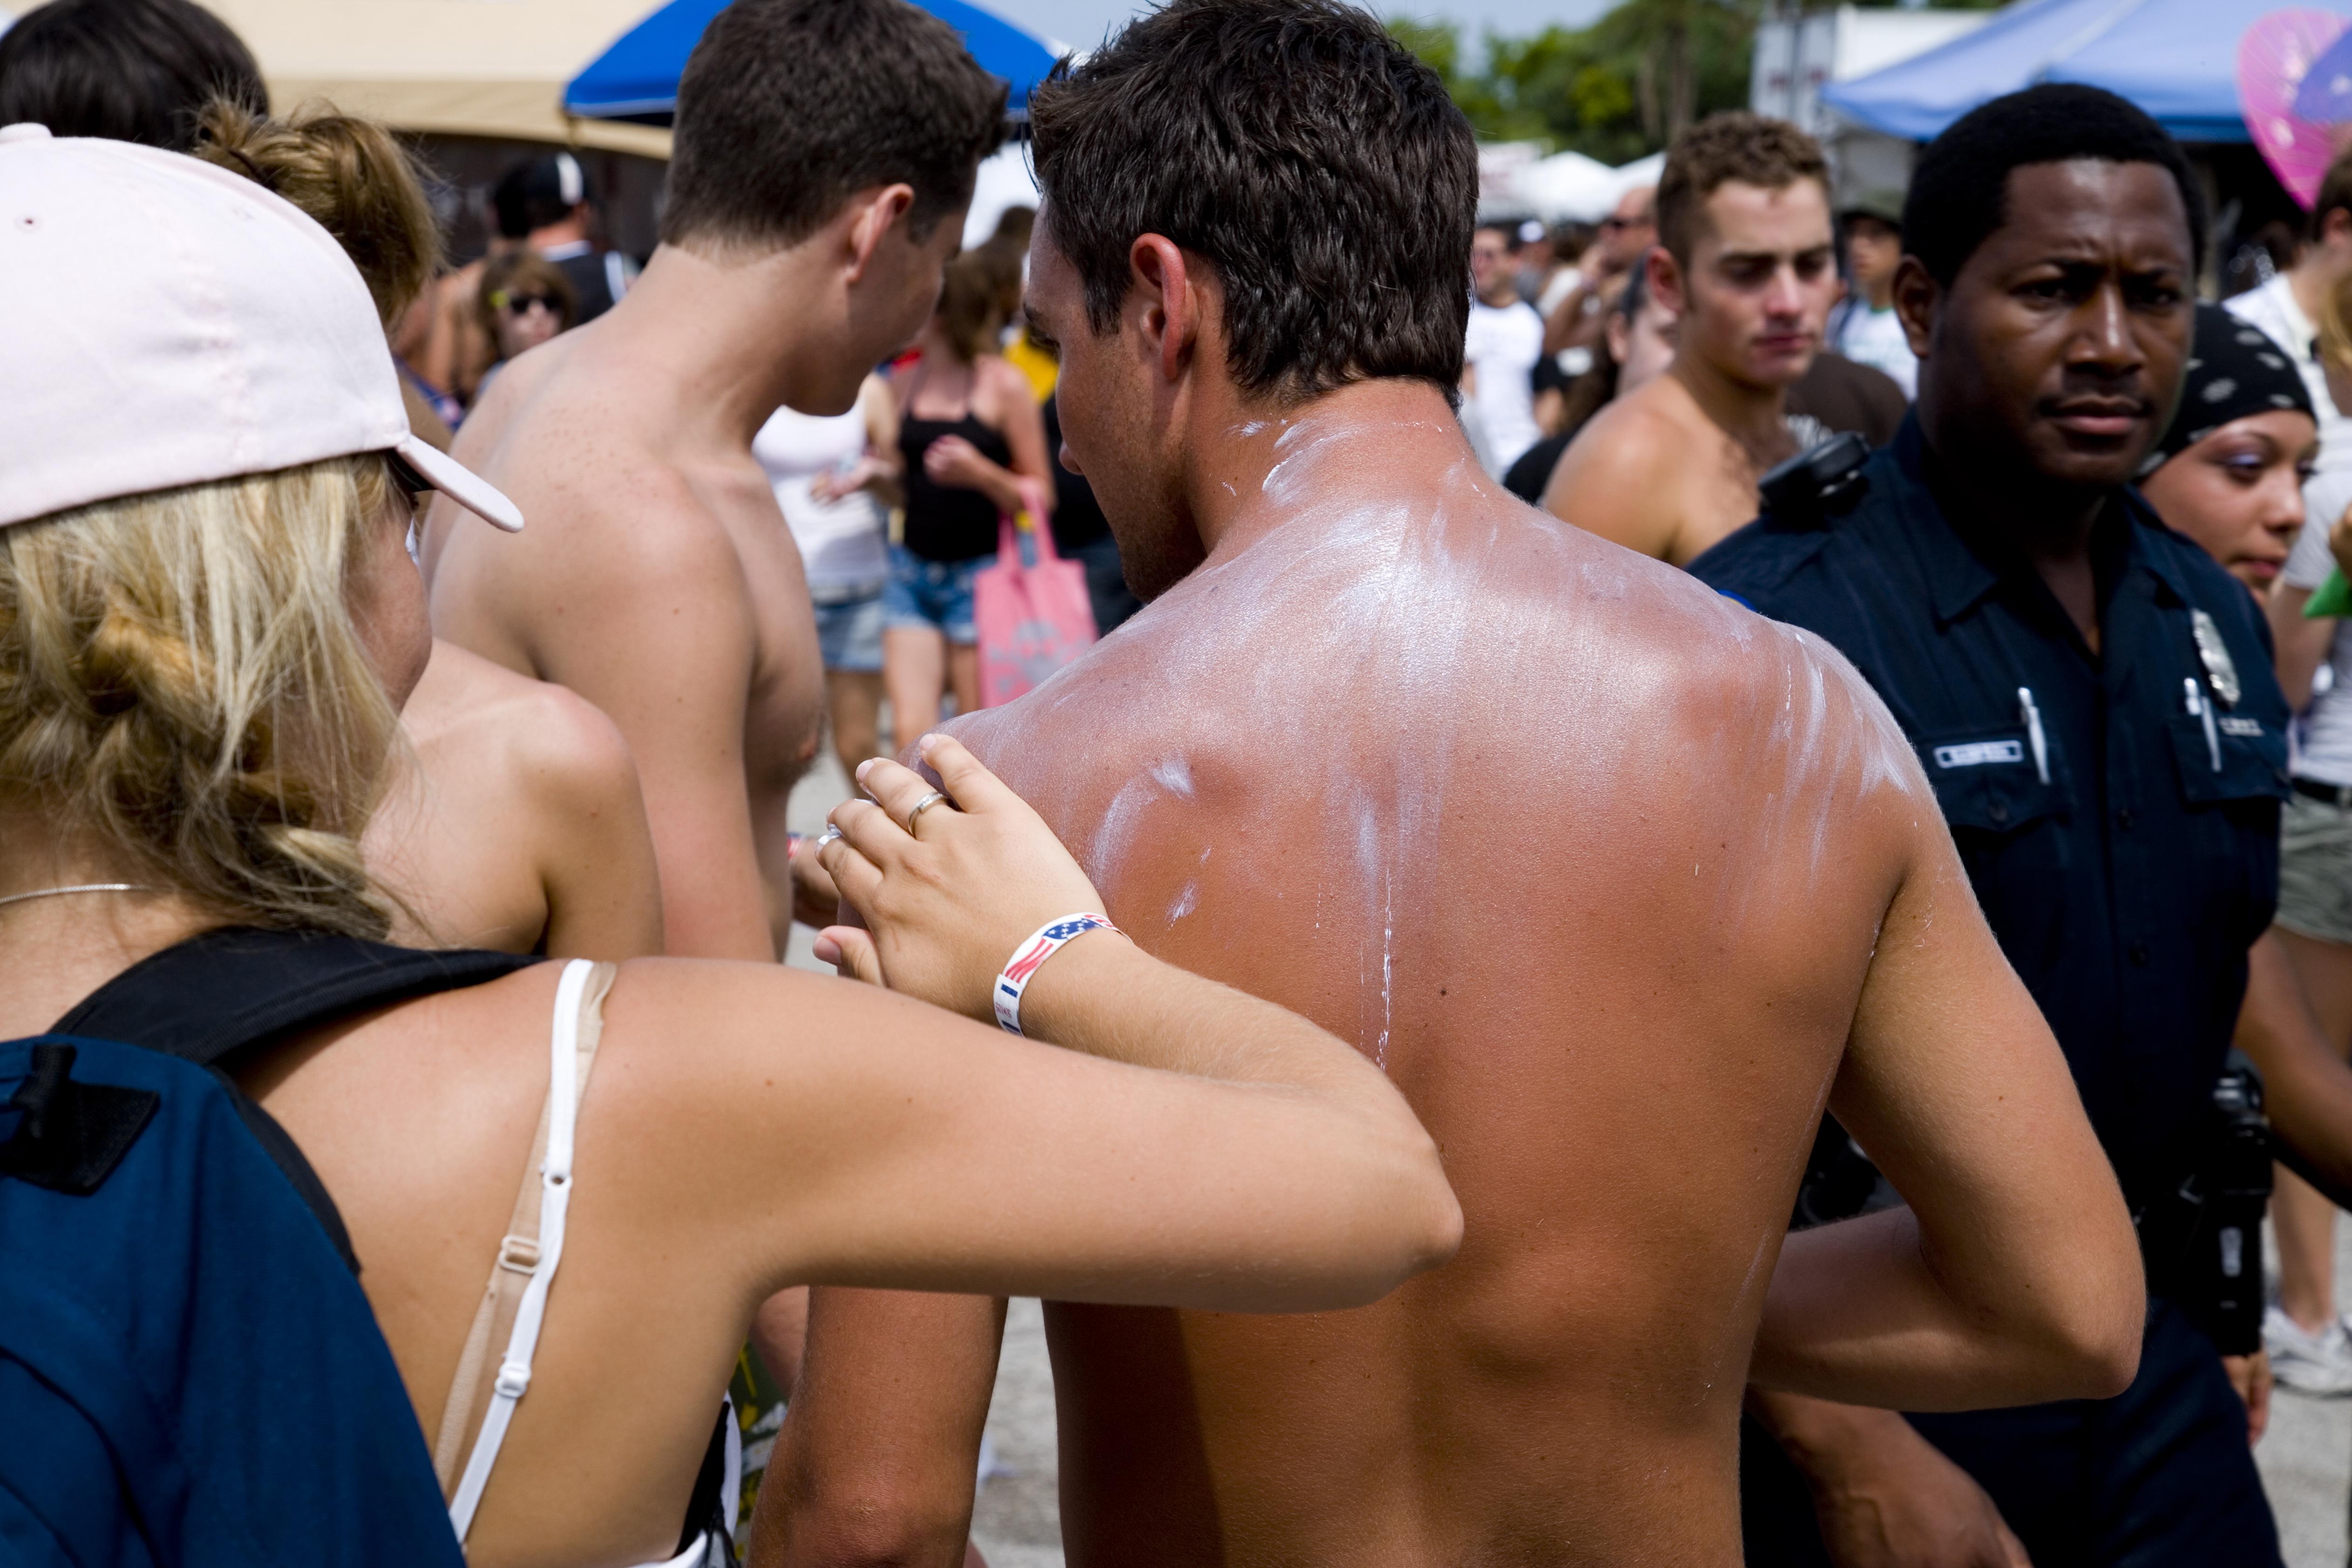 A girl applying suntan cream to the back of a sunburnt man. Vans Warped Tour, USA touring punk rock music festival, Bicentennial park, Miami, Florida, USA. 24th June 2006